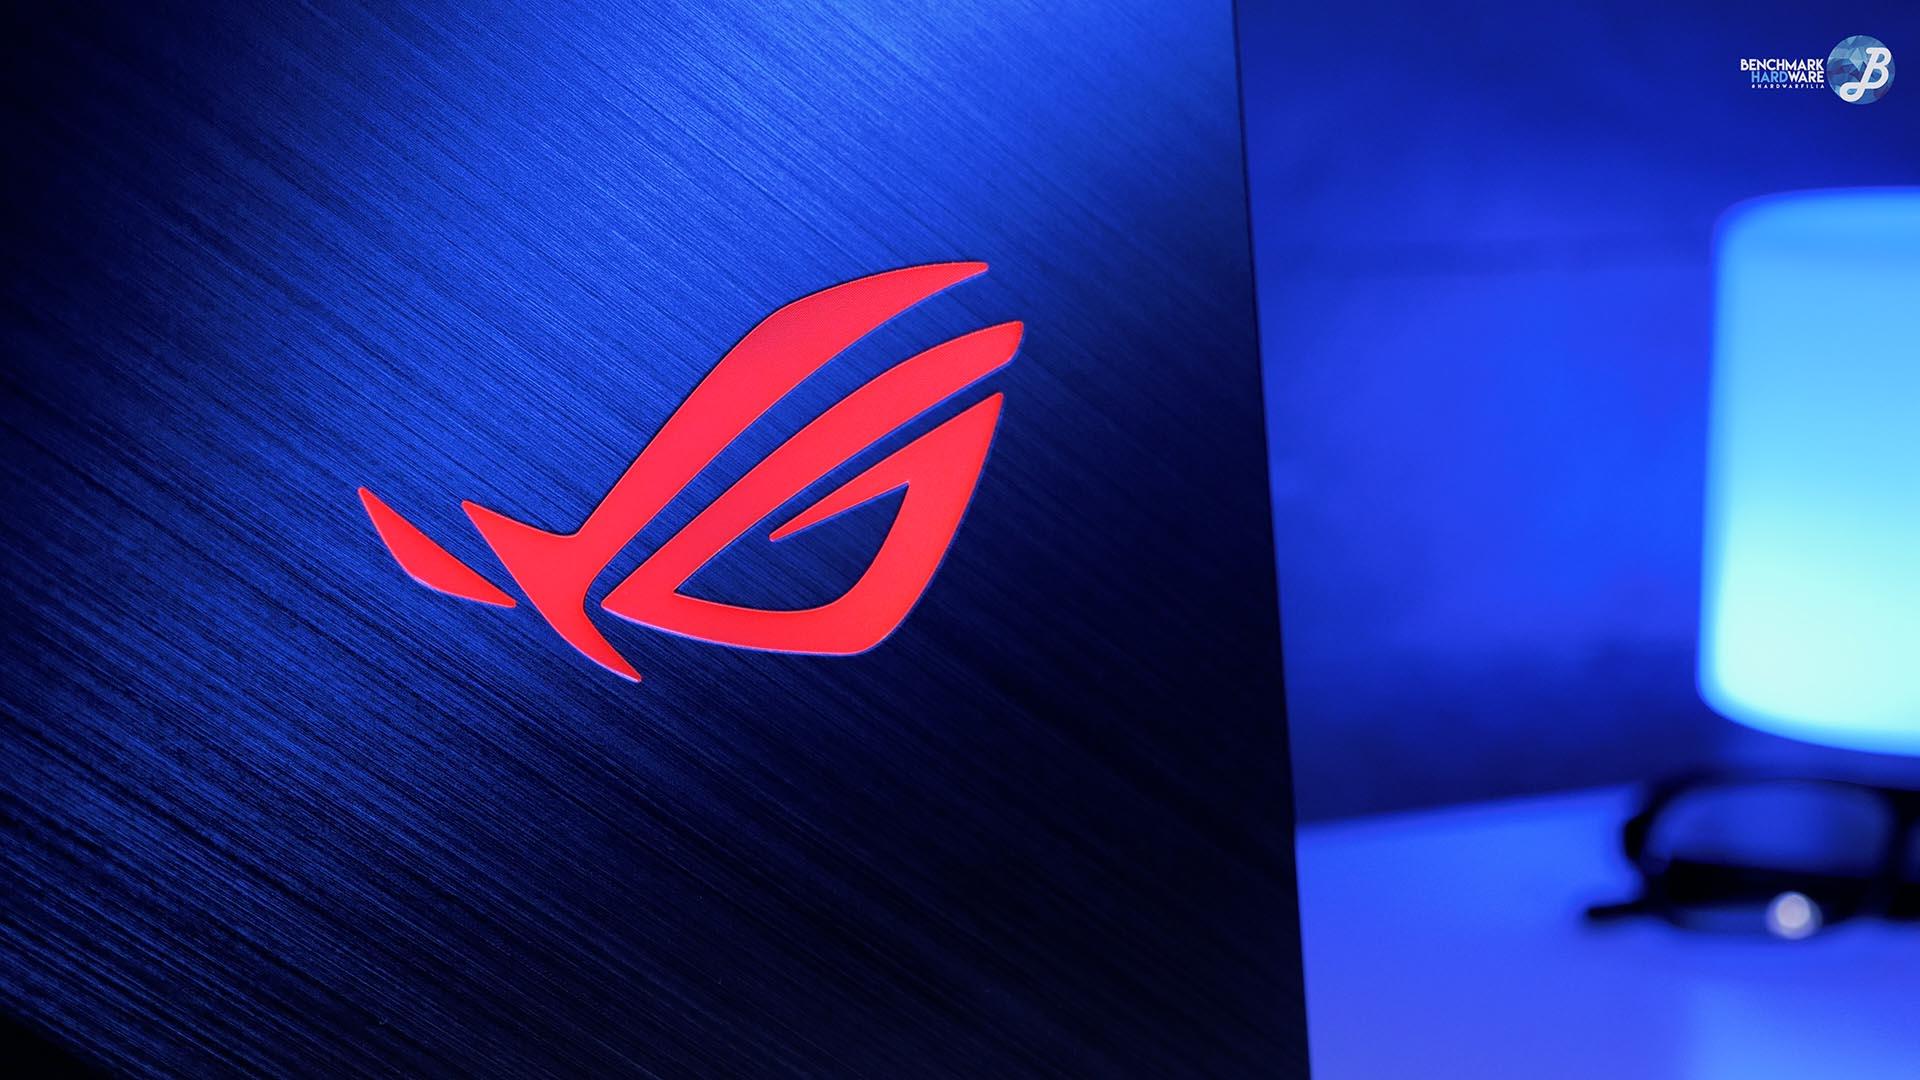 Asus Scar II - Logo ROG RGB